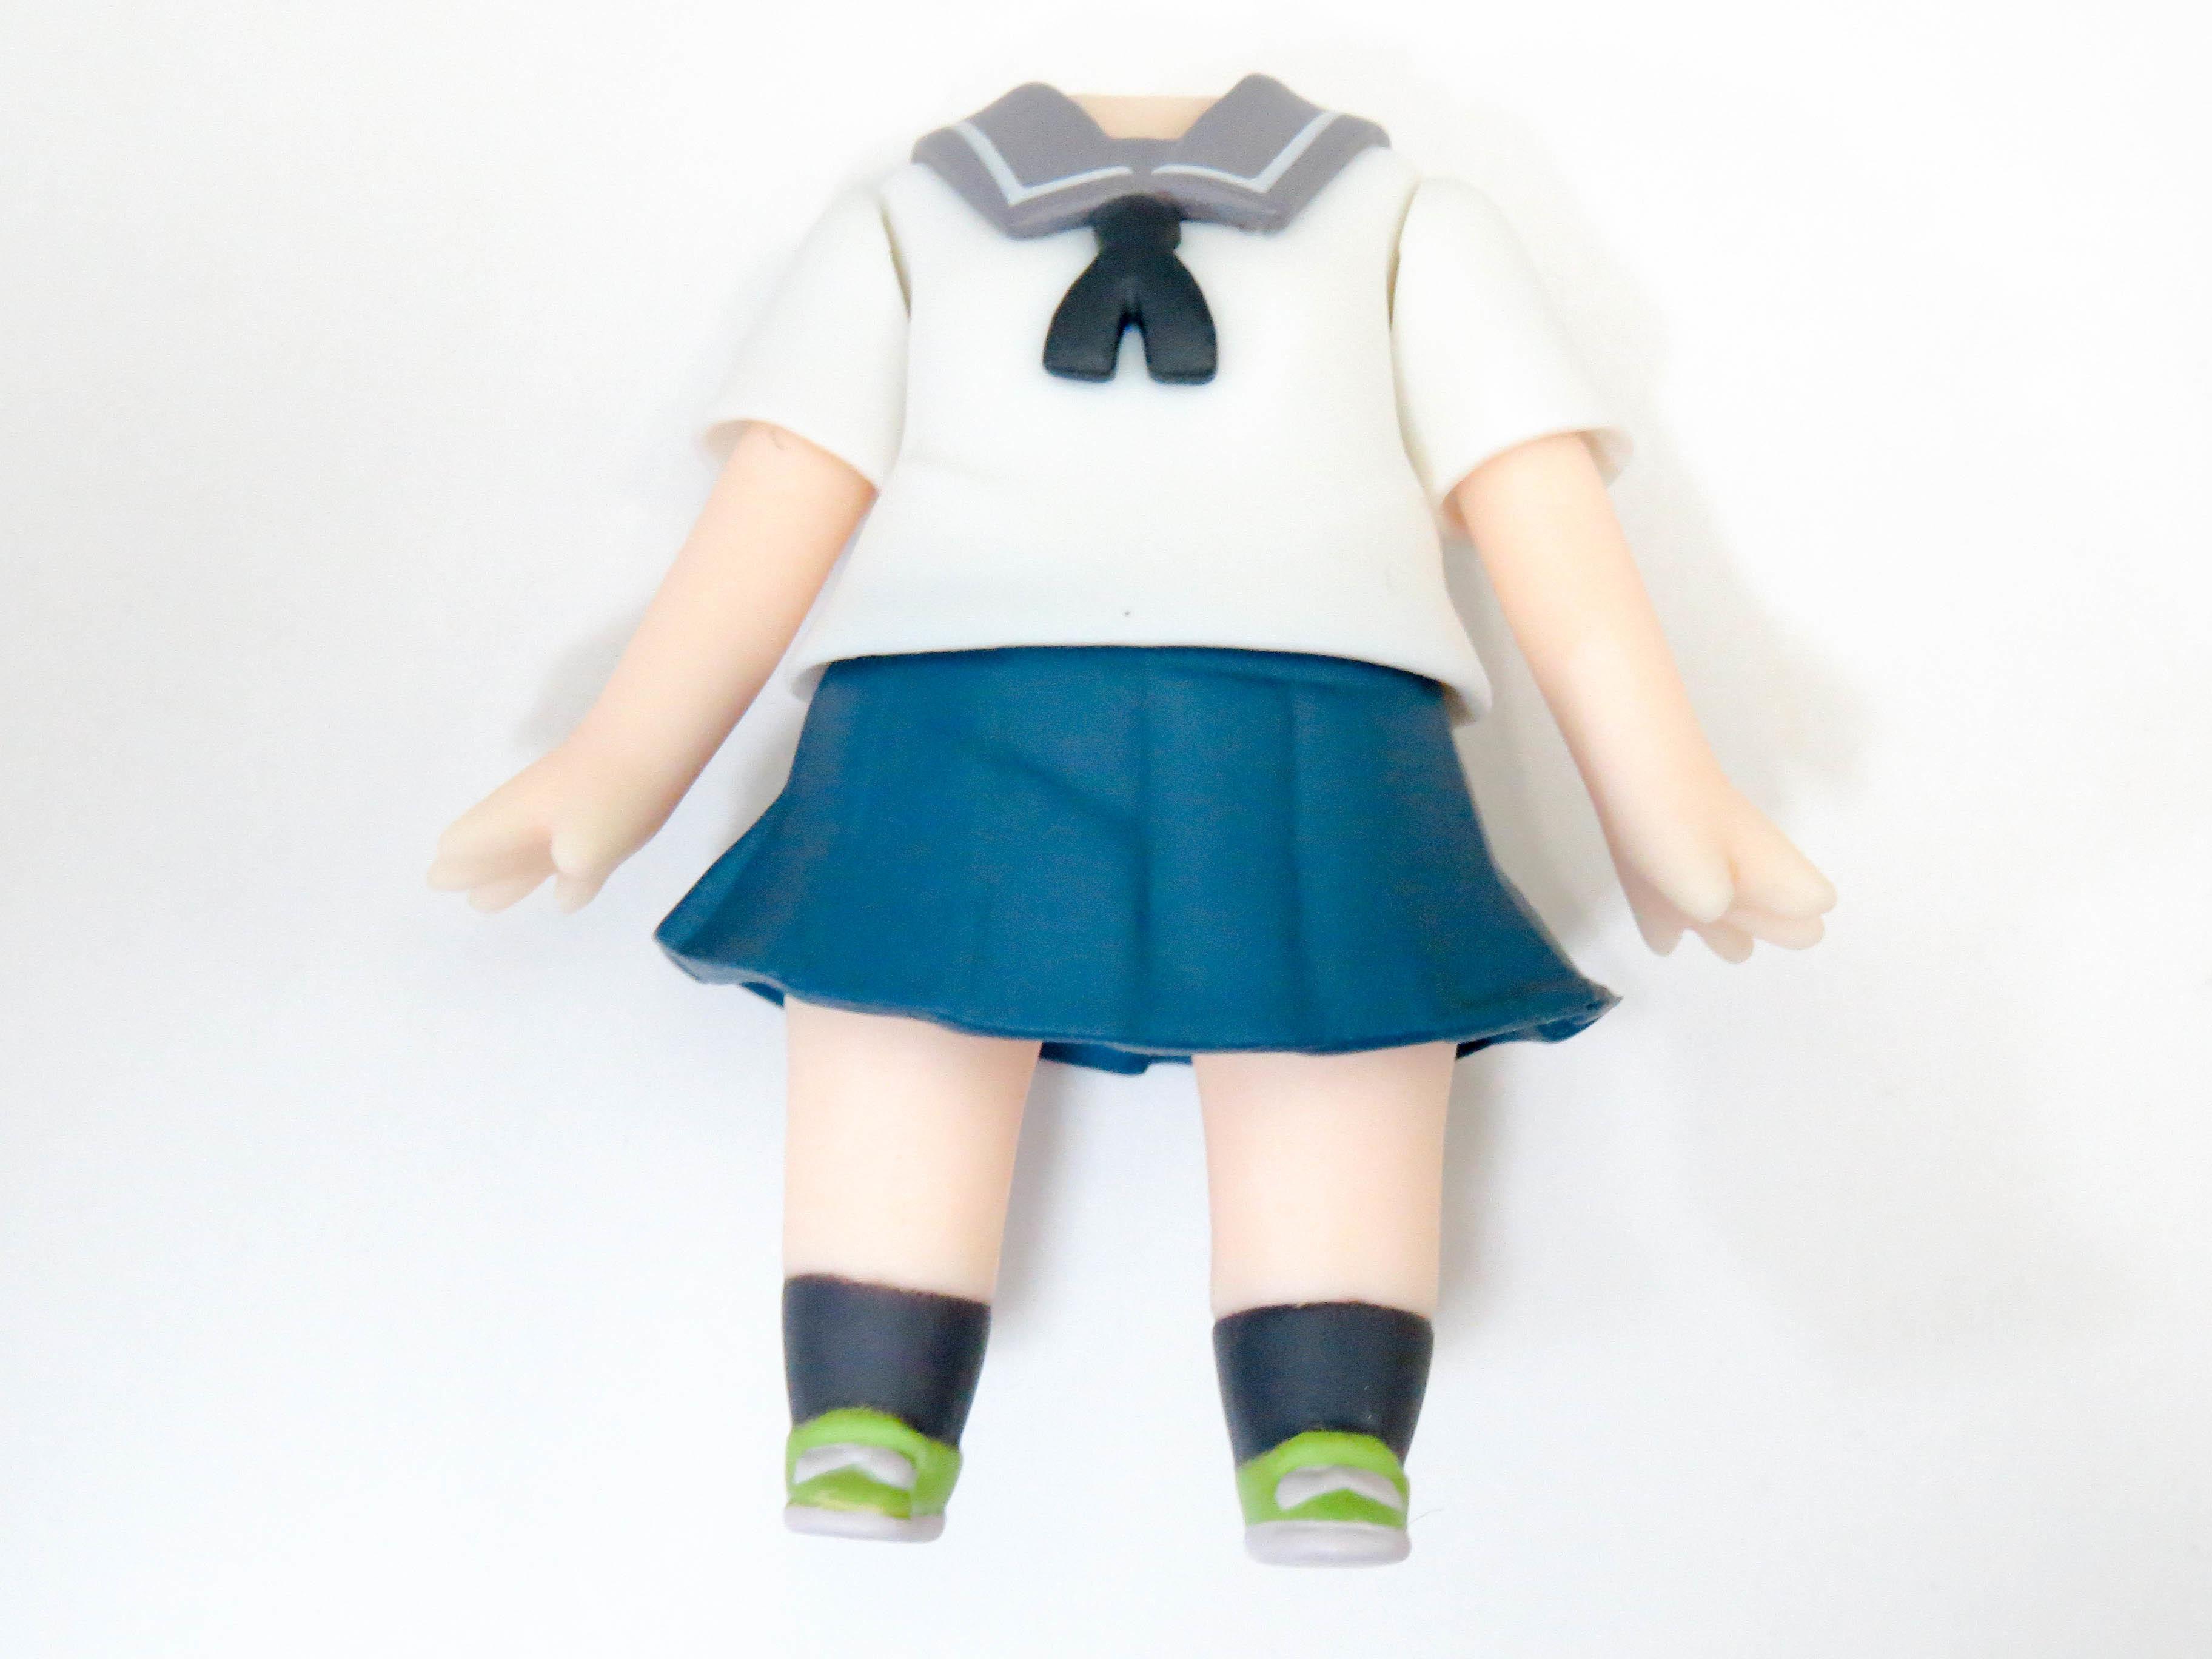 【SALE】【969】 三谷裳ちお 体パーツ 制服 ねんどろいど